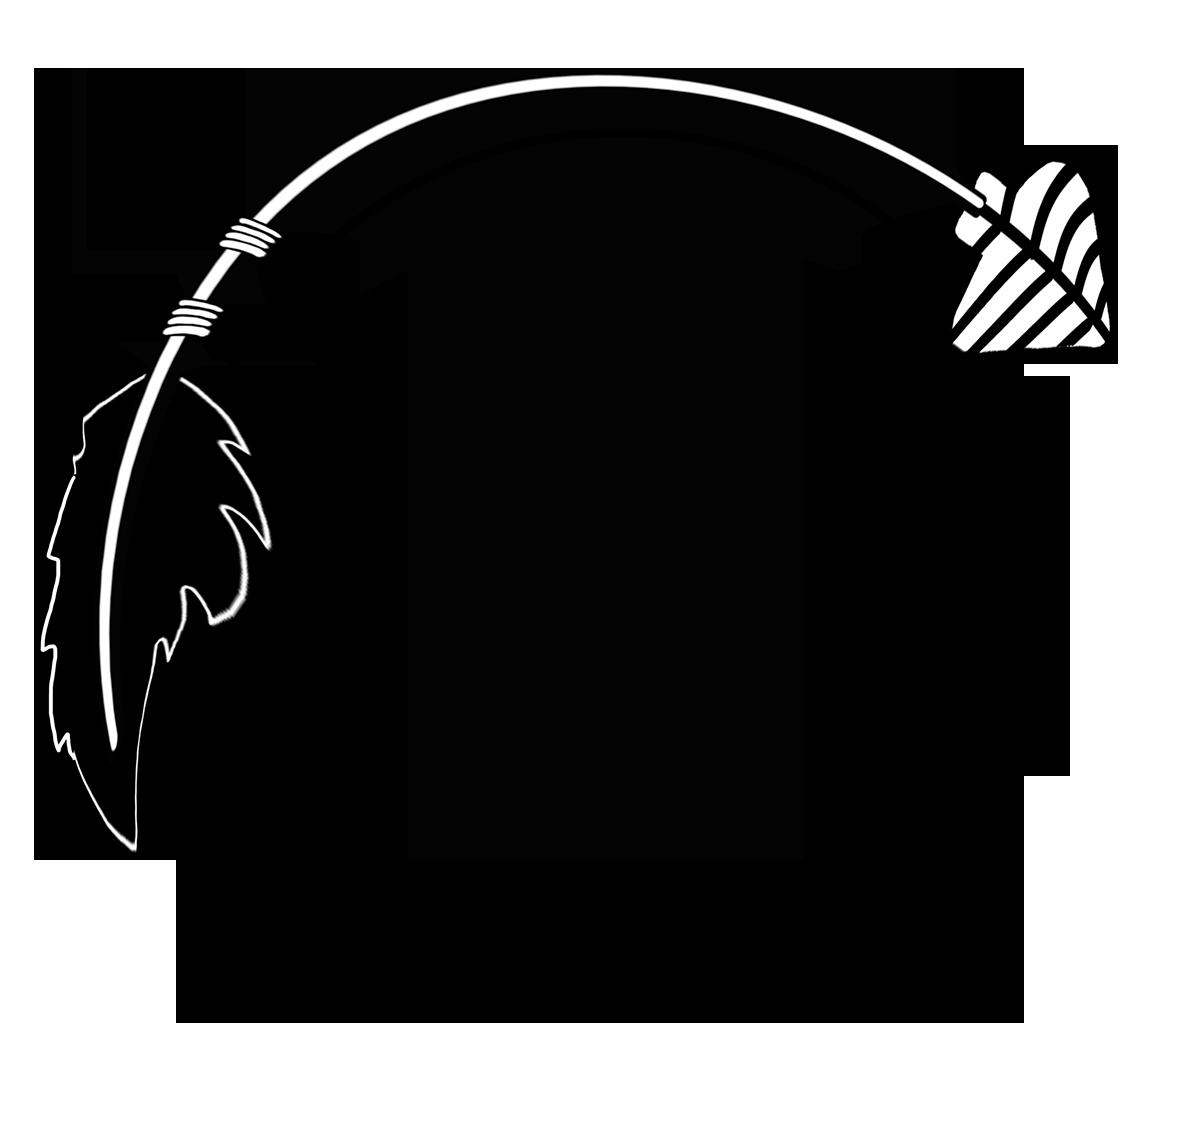 black curved arrow frame.